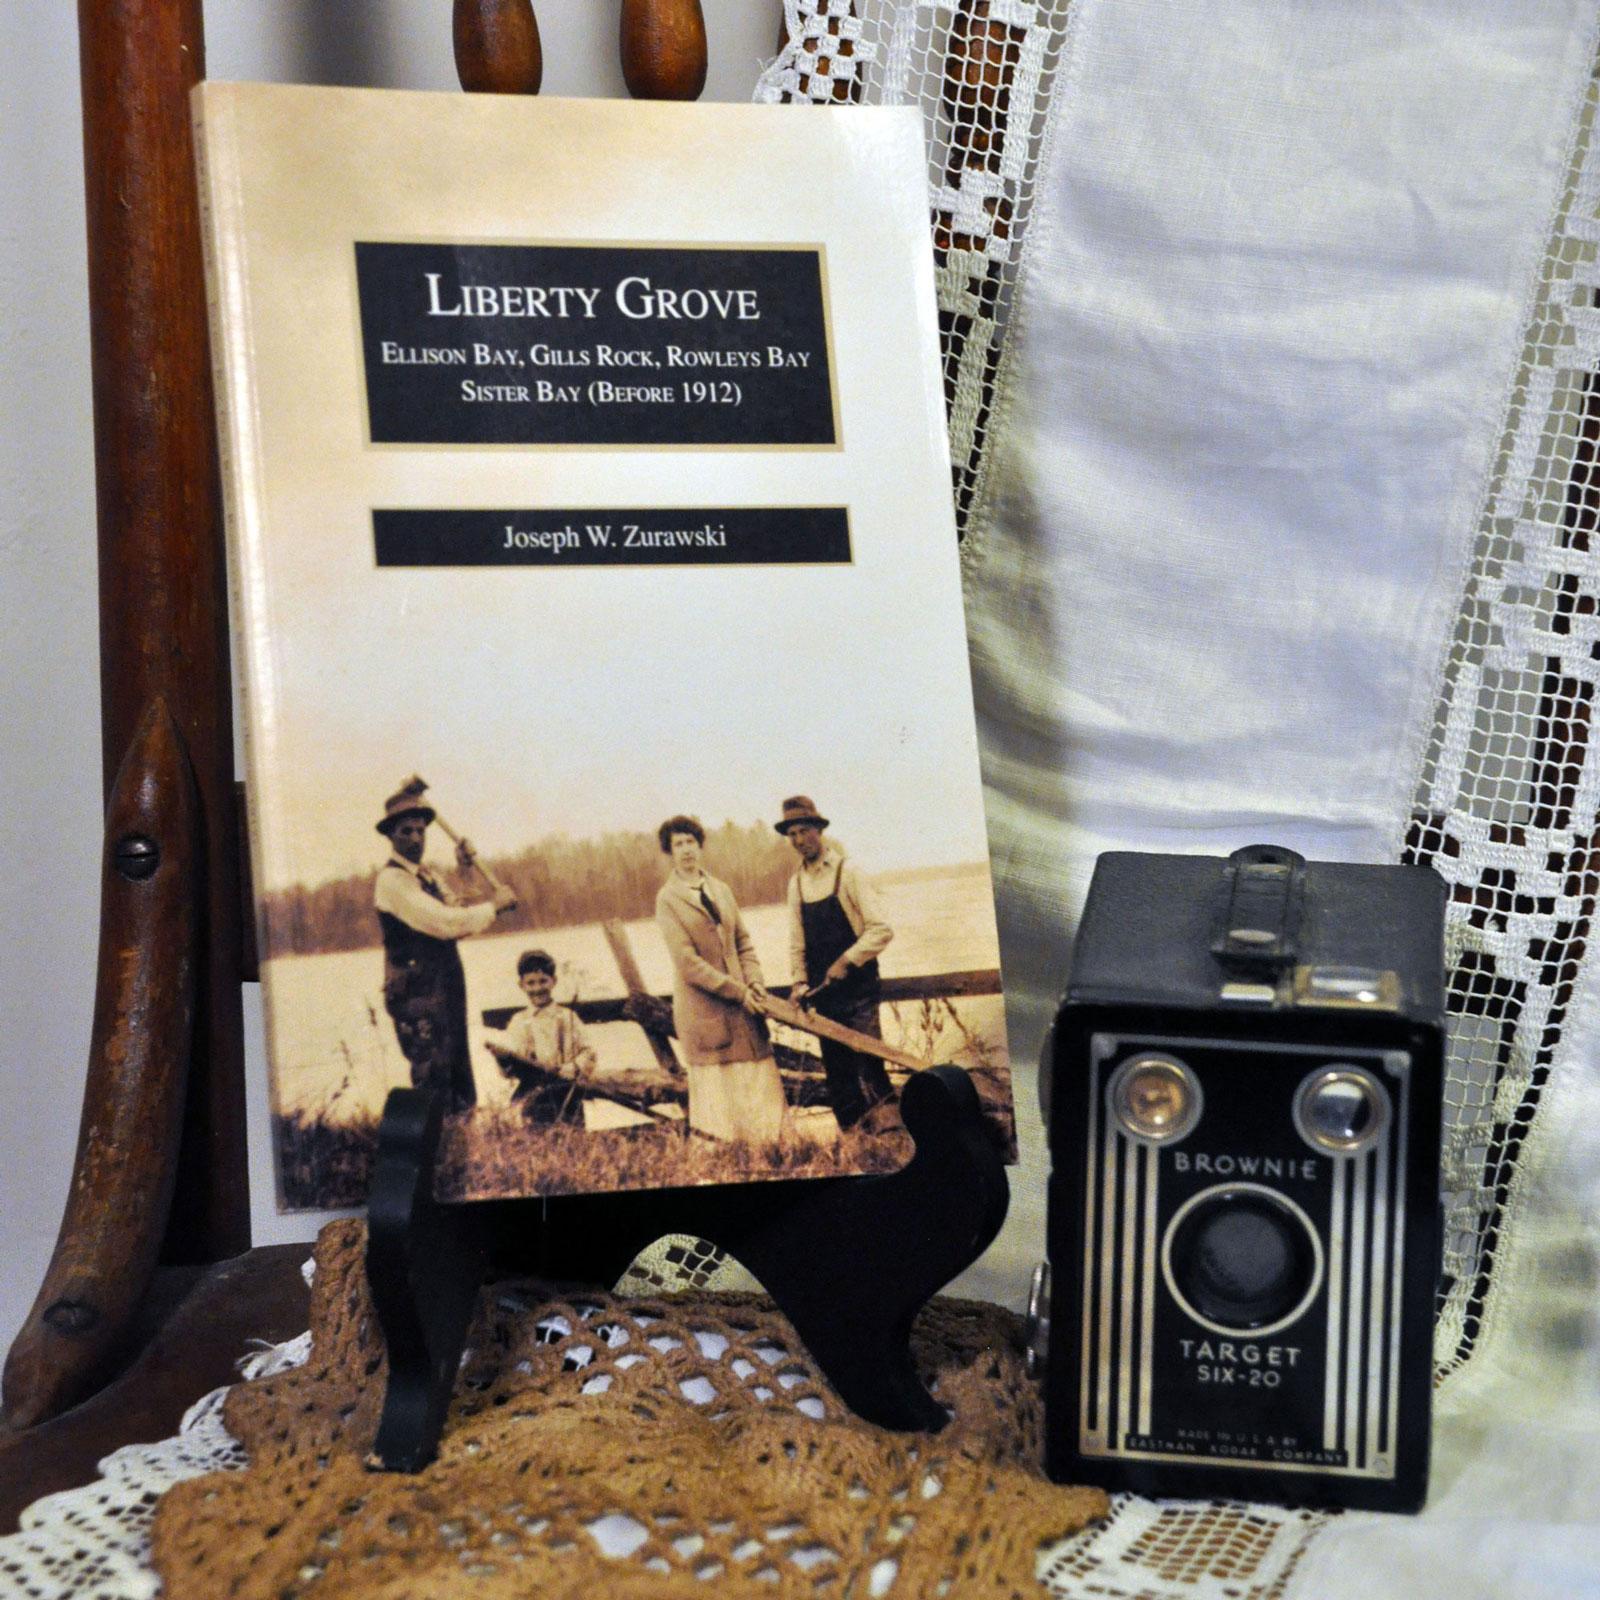 Liberty Grove: Ellison Bay, Gills Rock, & Rowleys Bay (Before 1912) by Joseph W. Zurawski